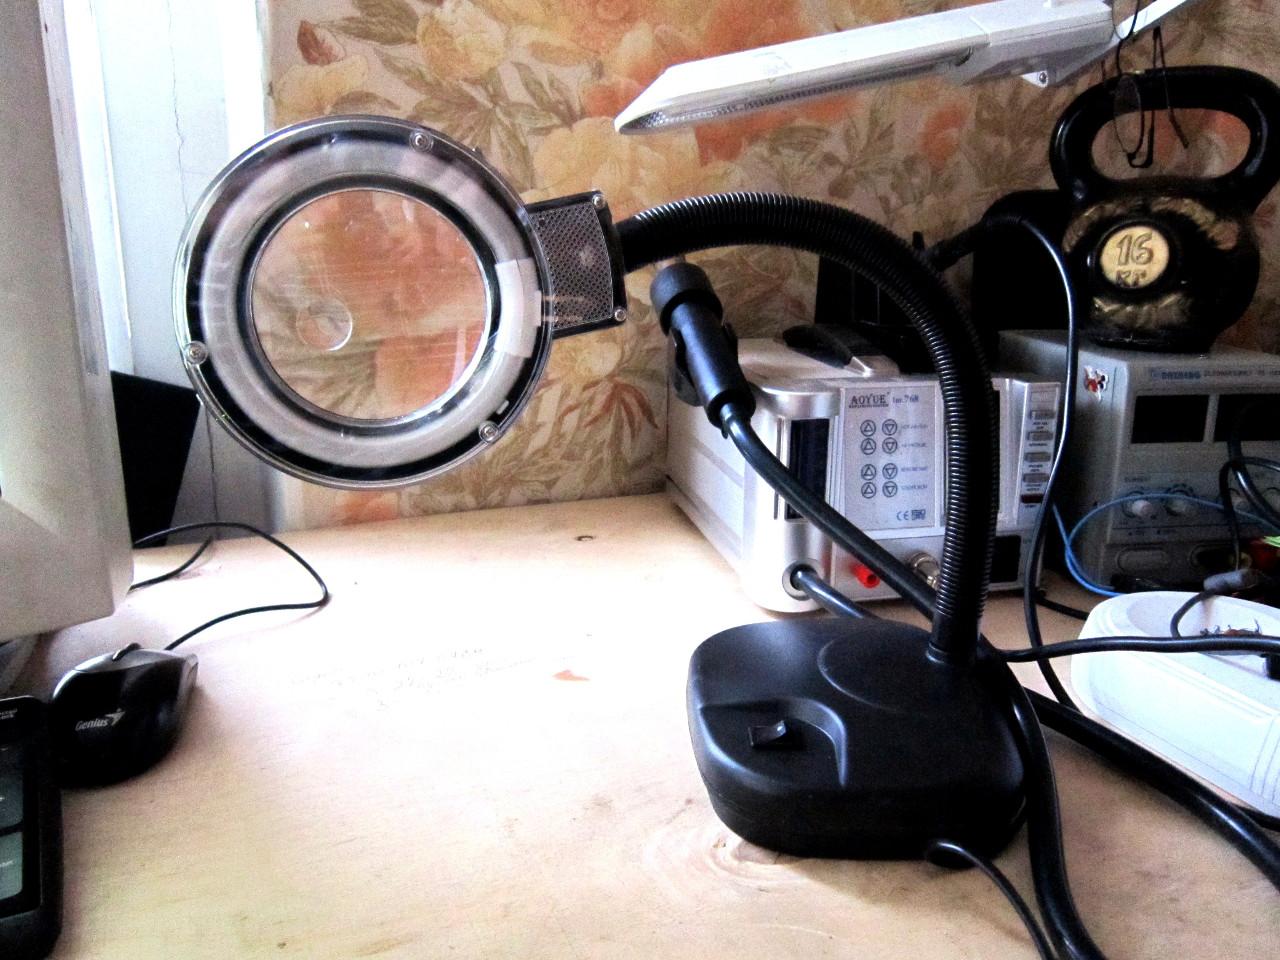 лампа лупа на рабочем столе